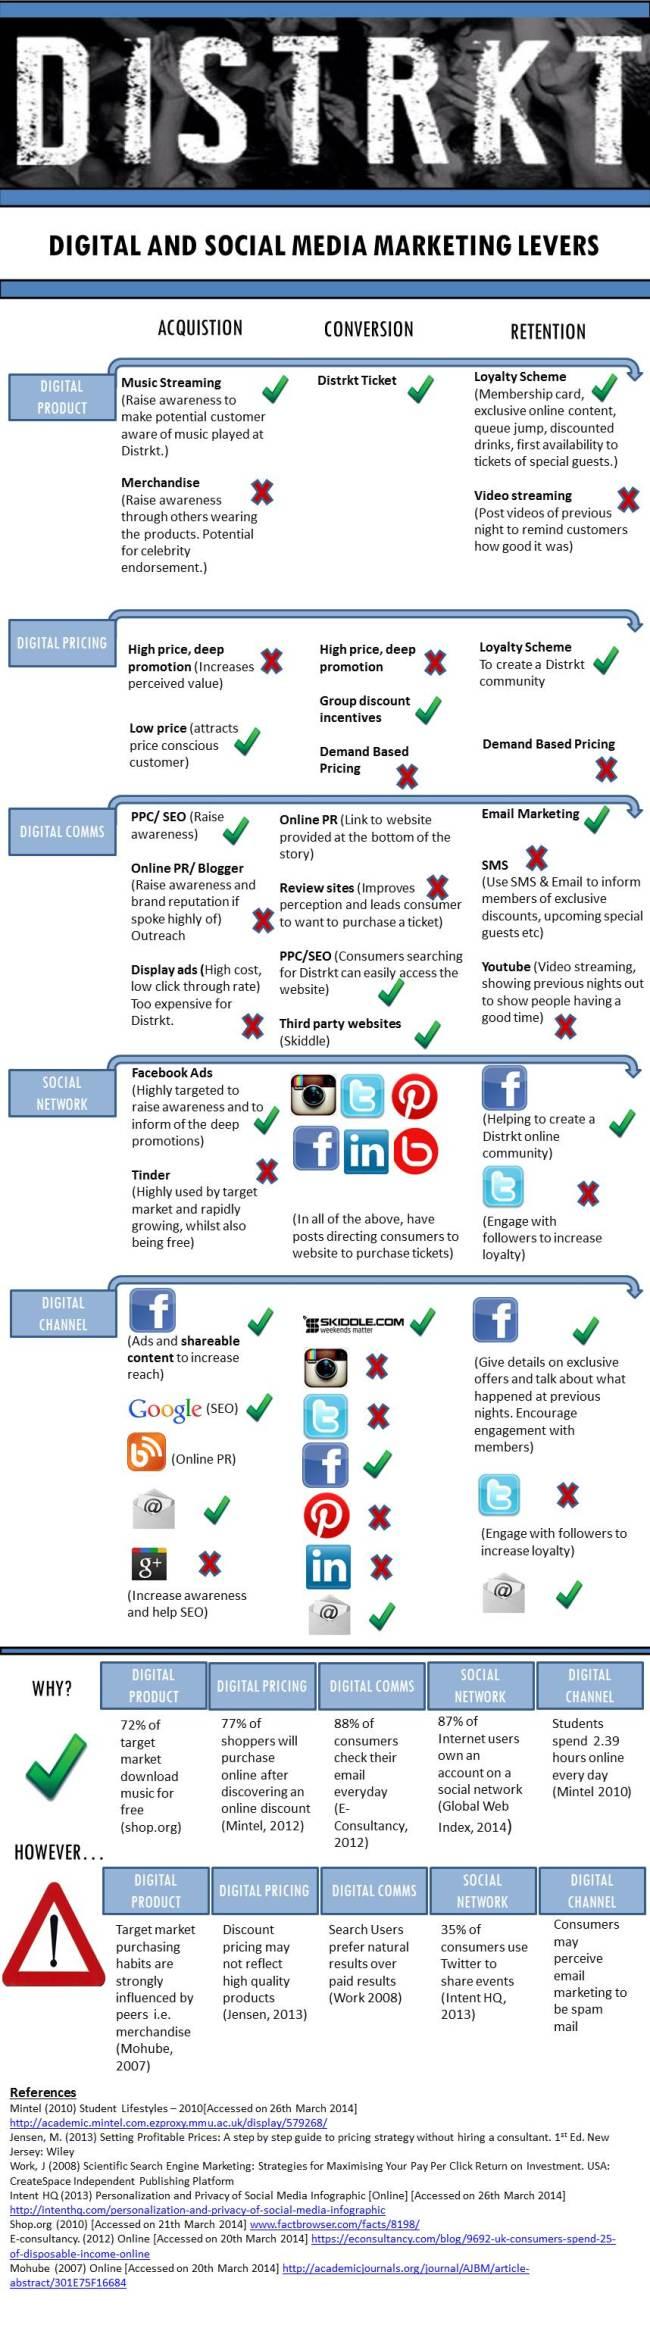 Marketing Matrix